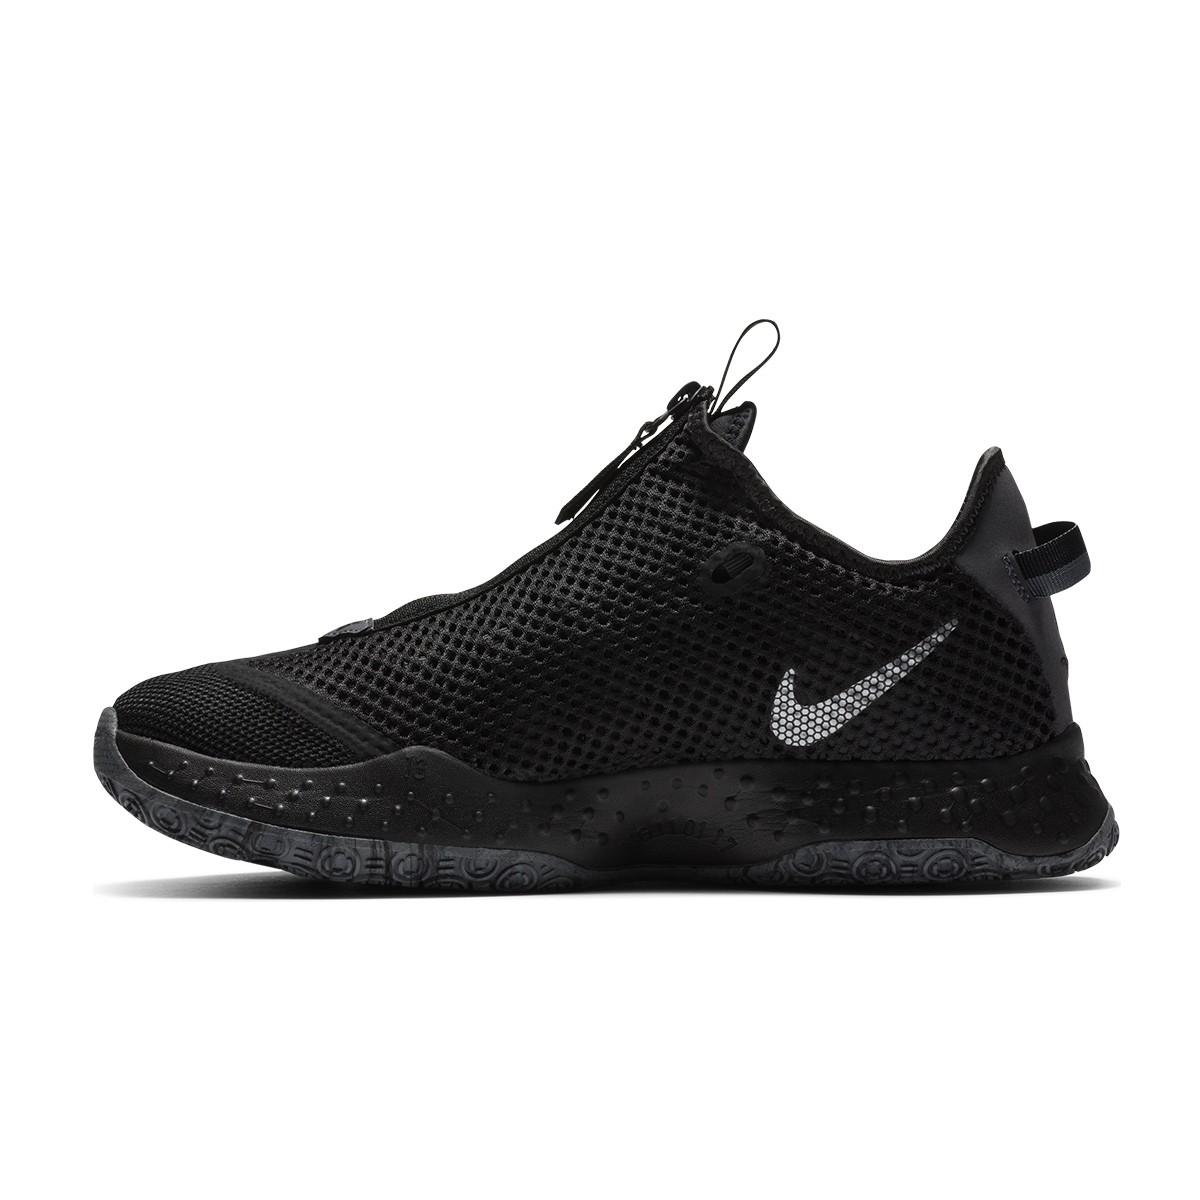 Nike PG 4 GS 'Triple Black'-CD5079-005-Jr